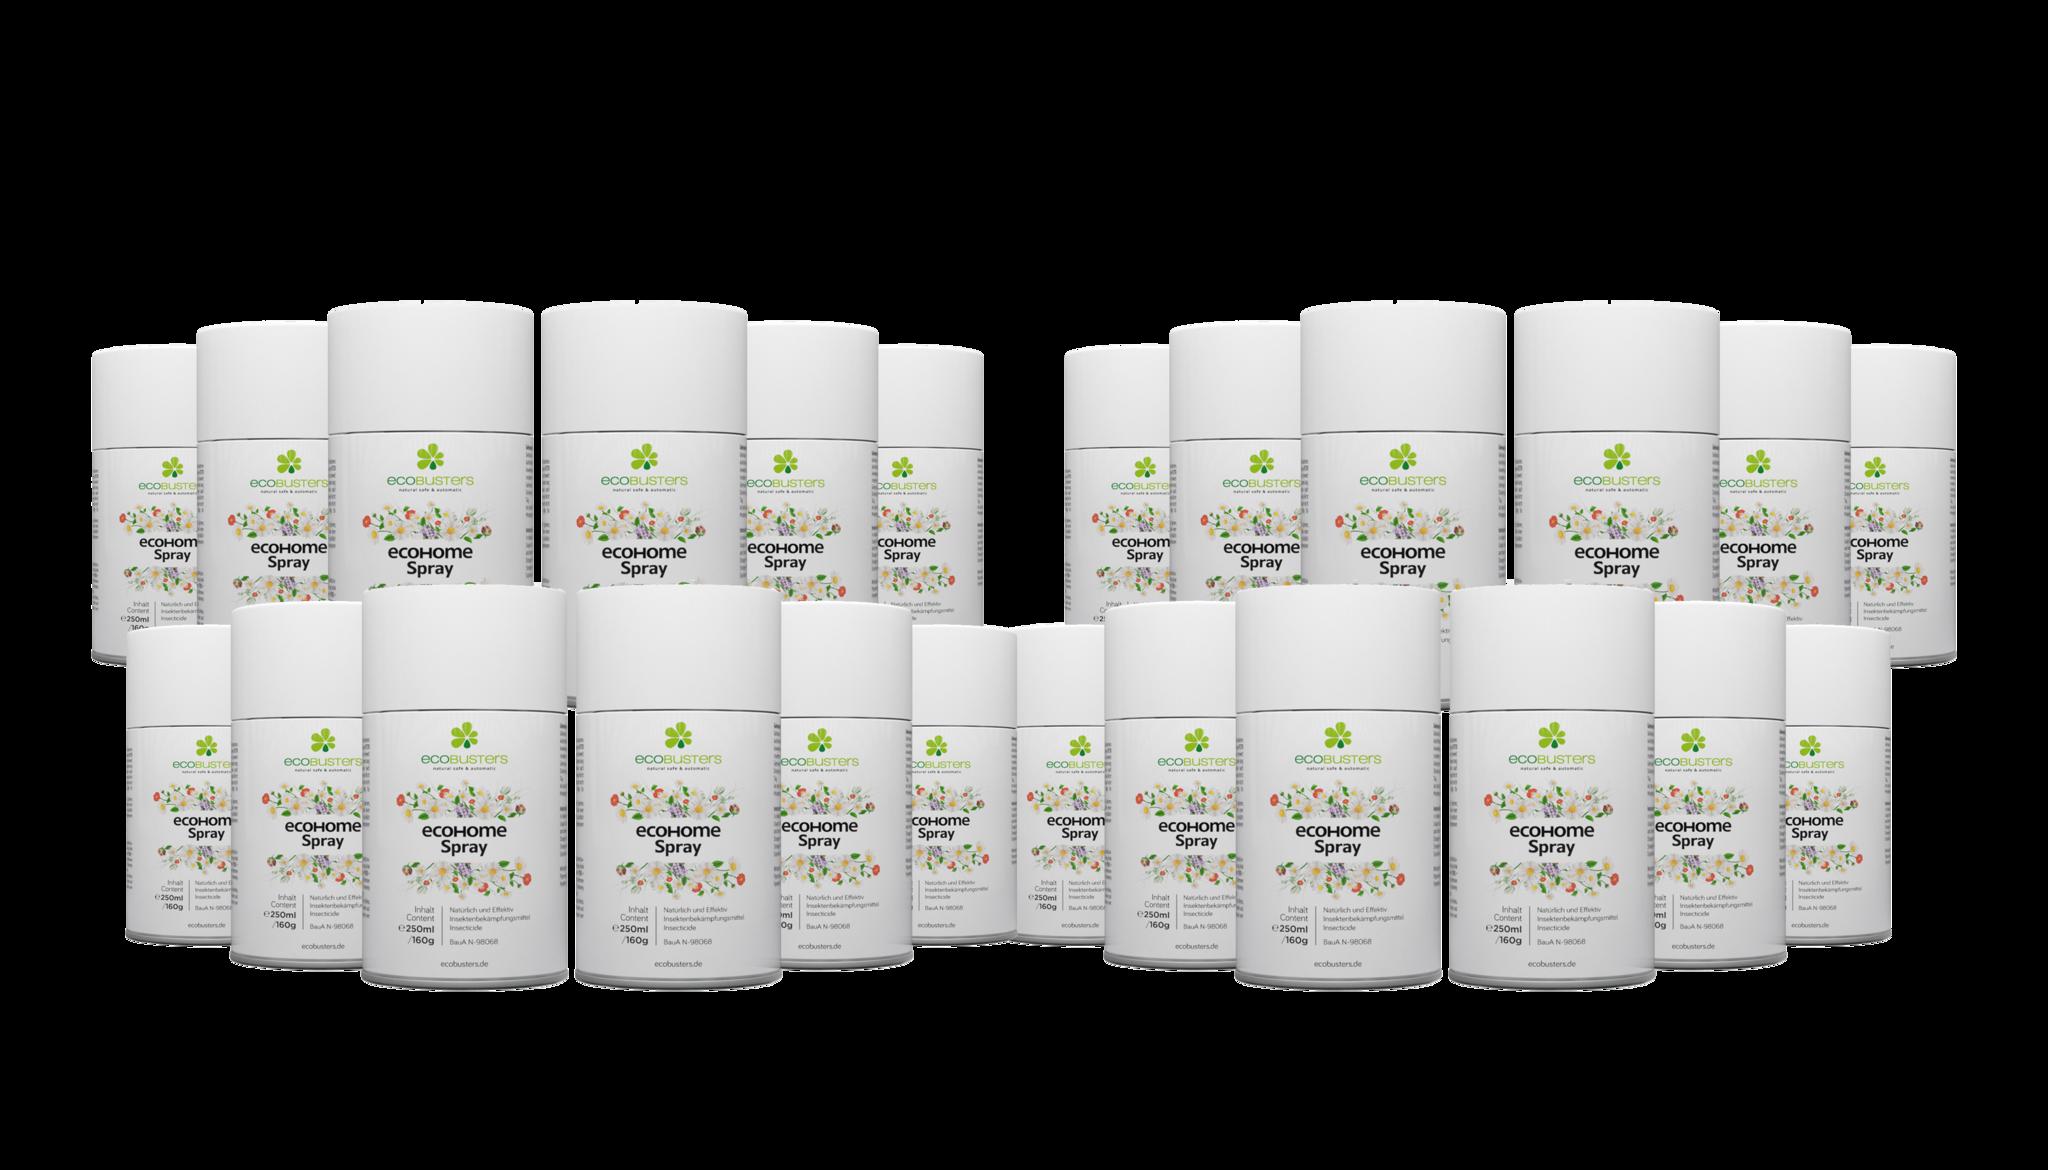 24x EcoHome-Spray